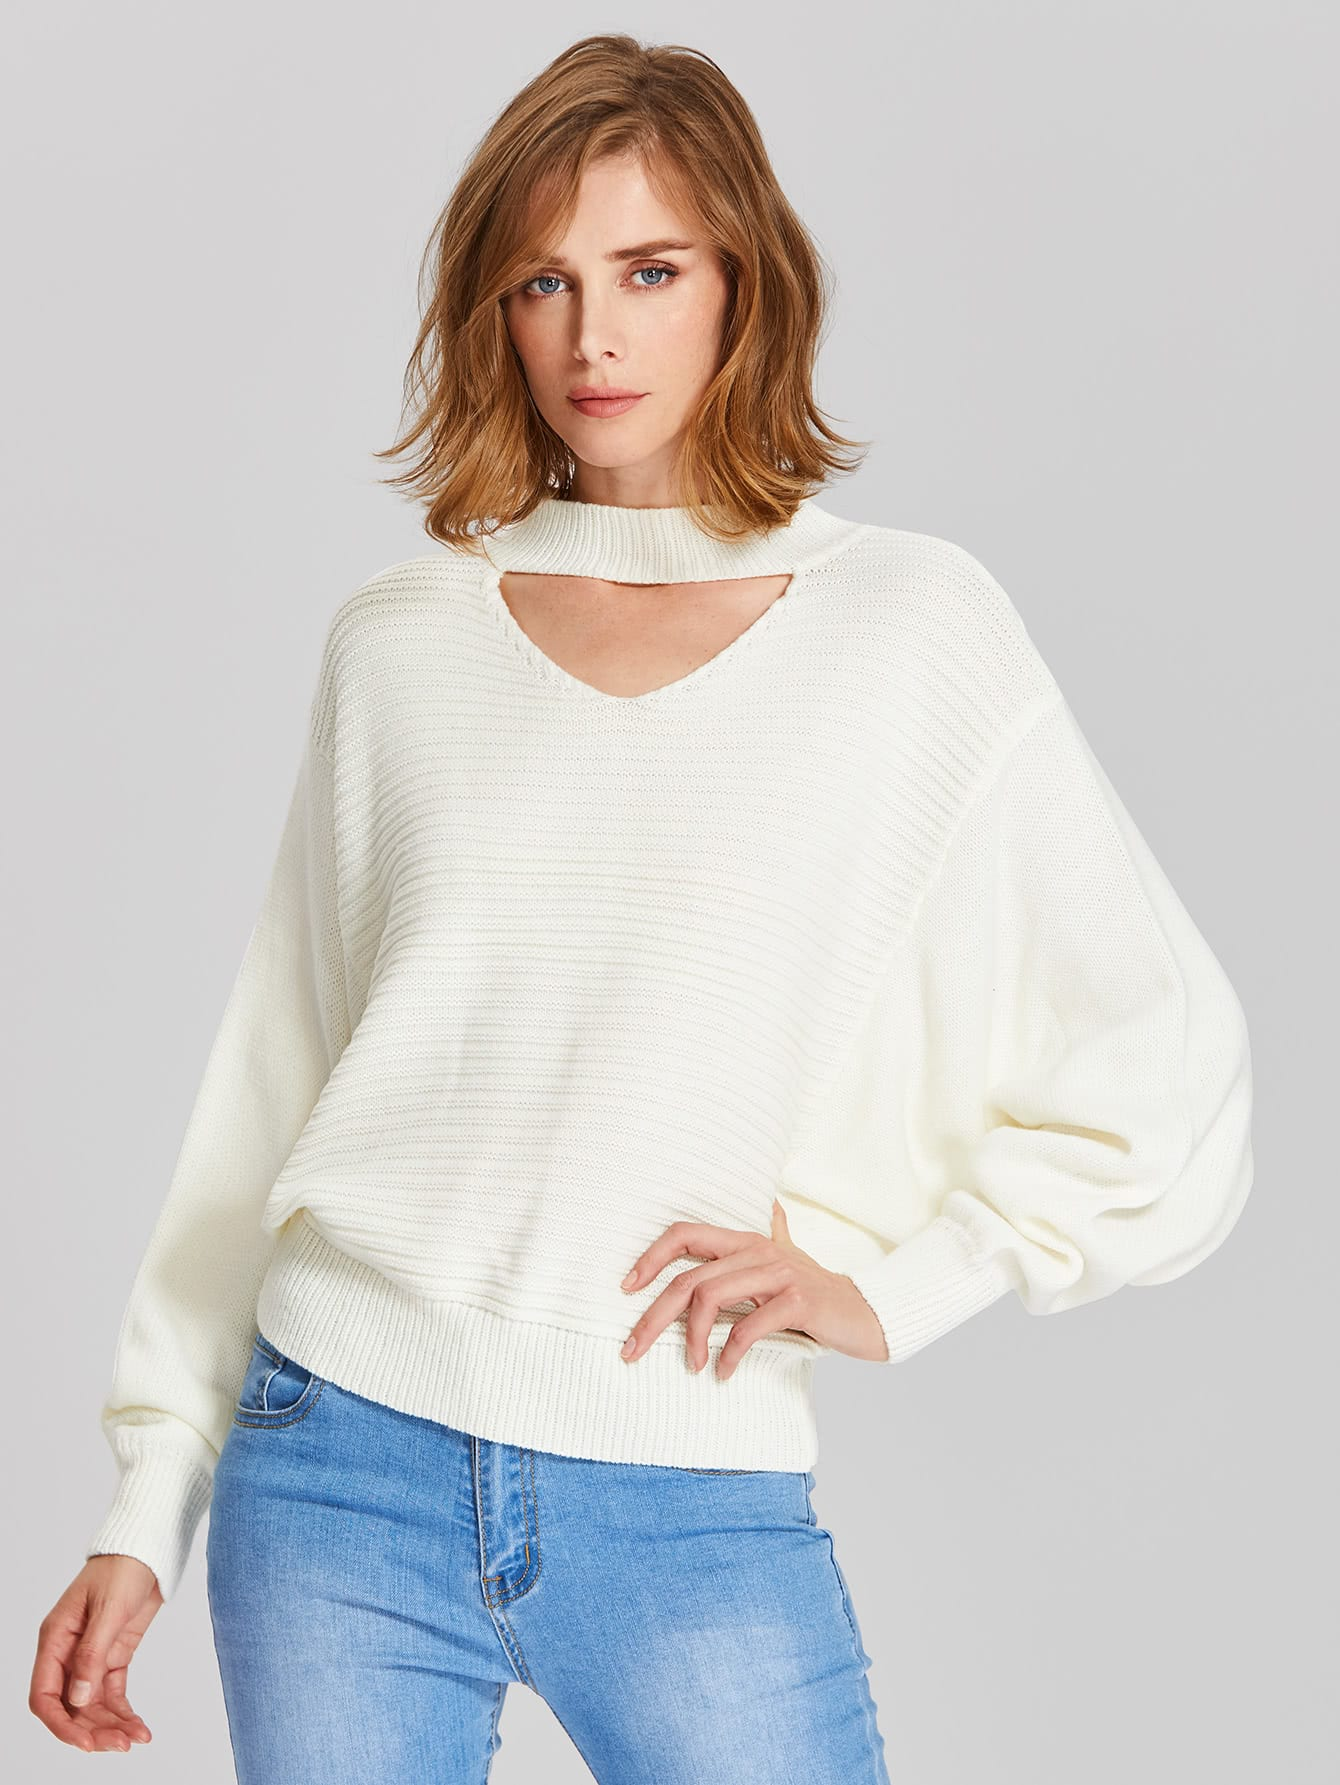 Cutout Dolman Sleeve Jumper sweater170627457